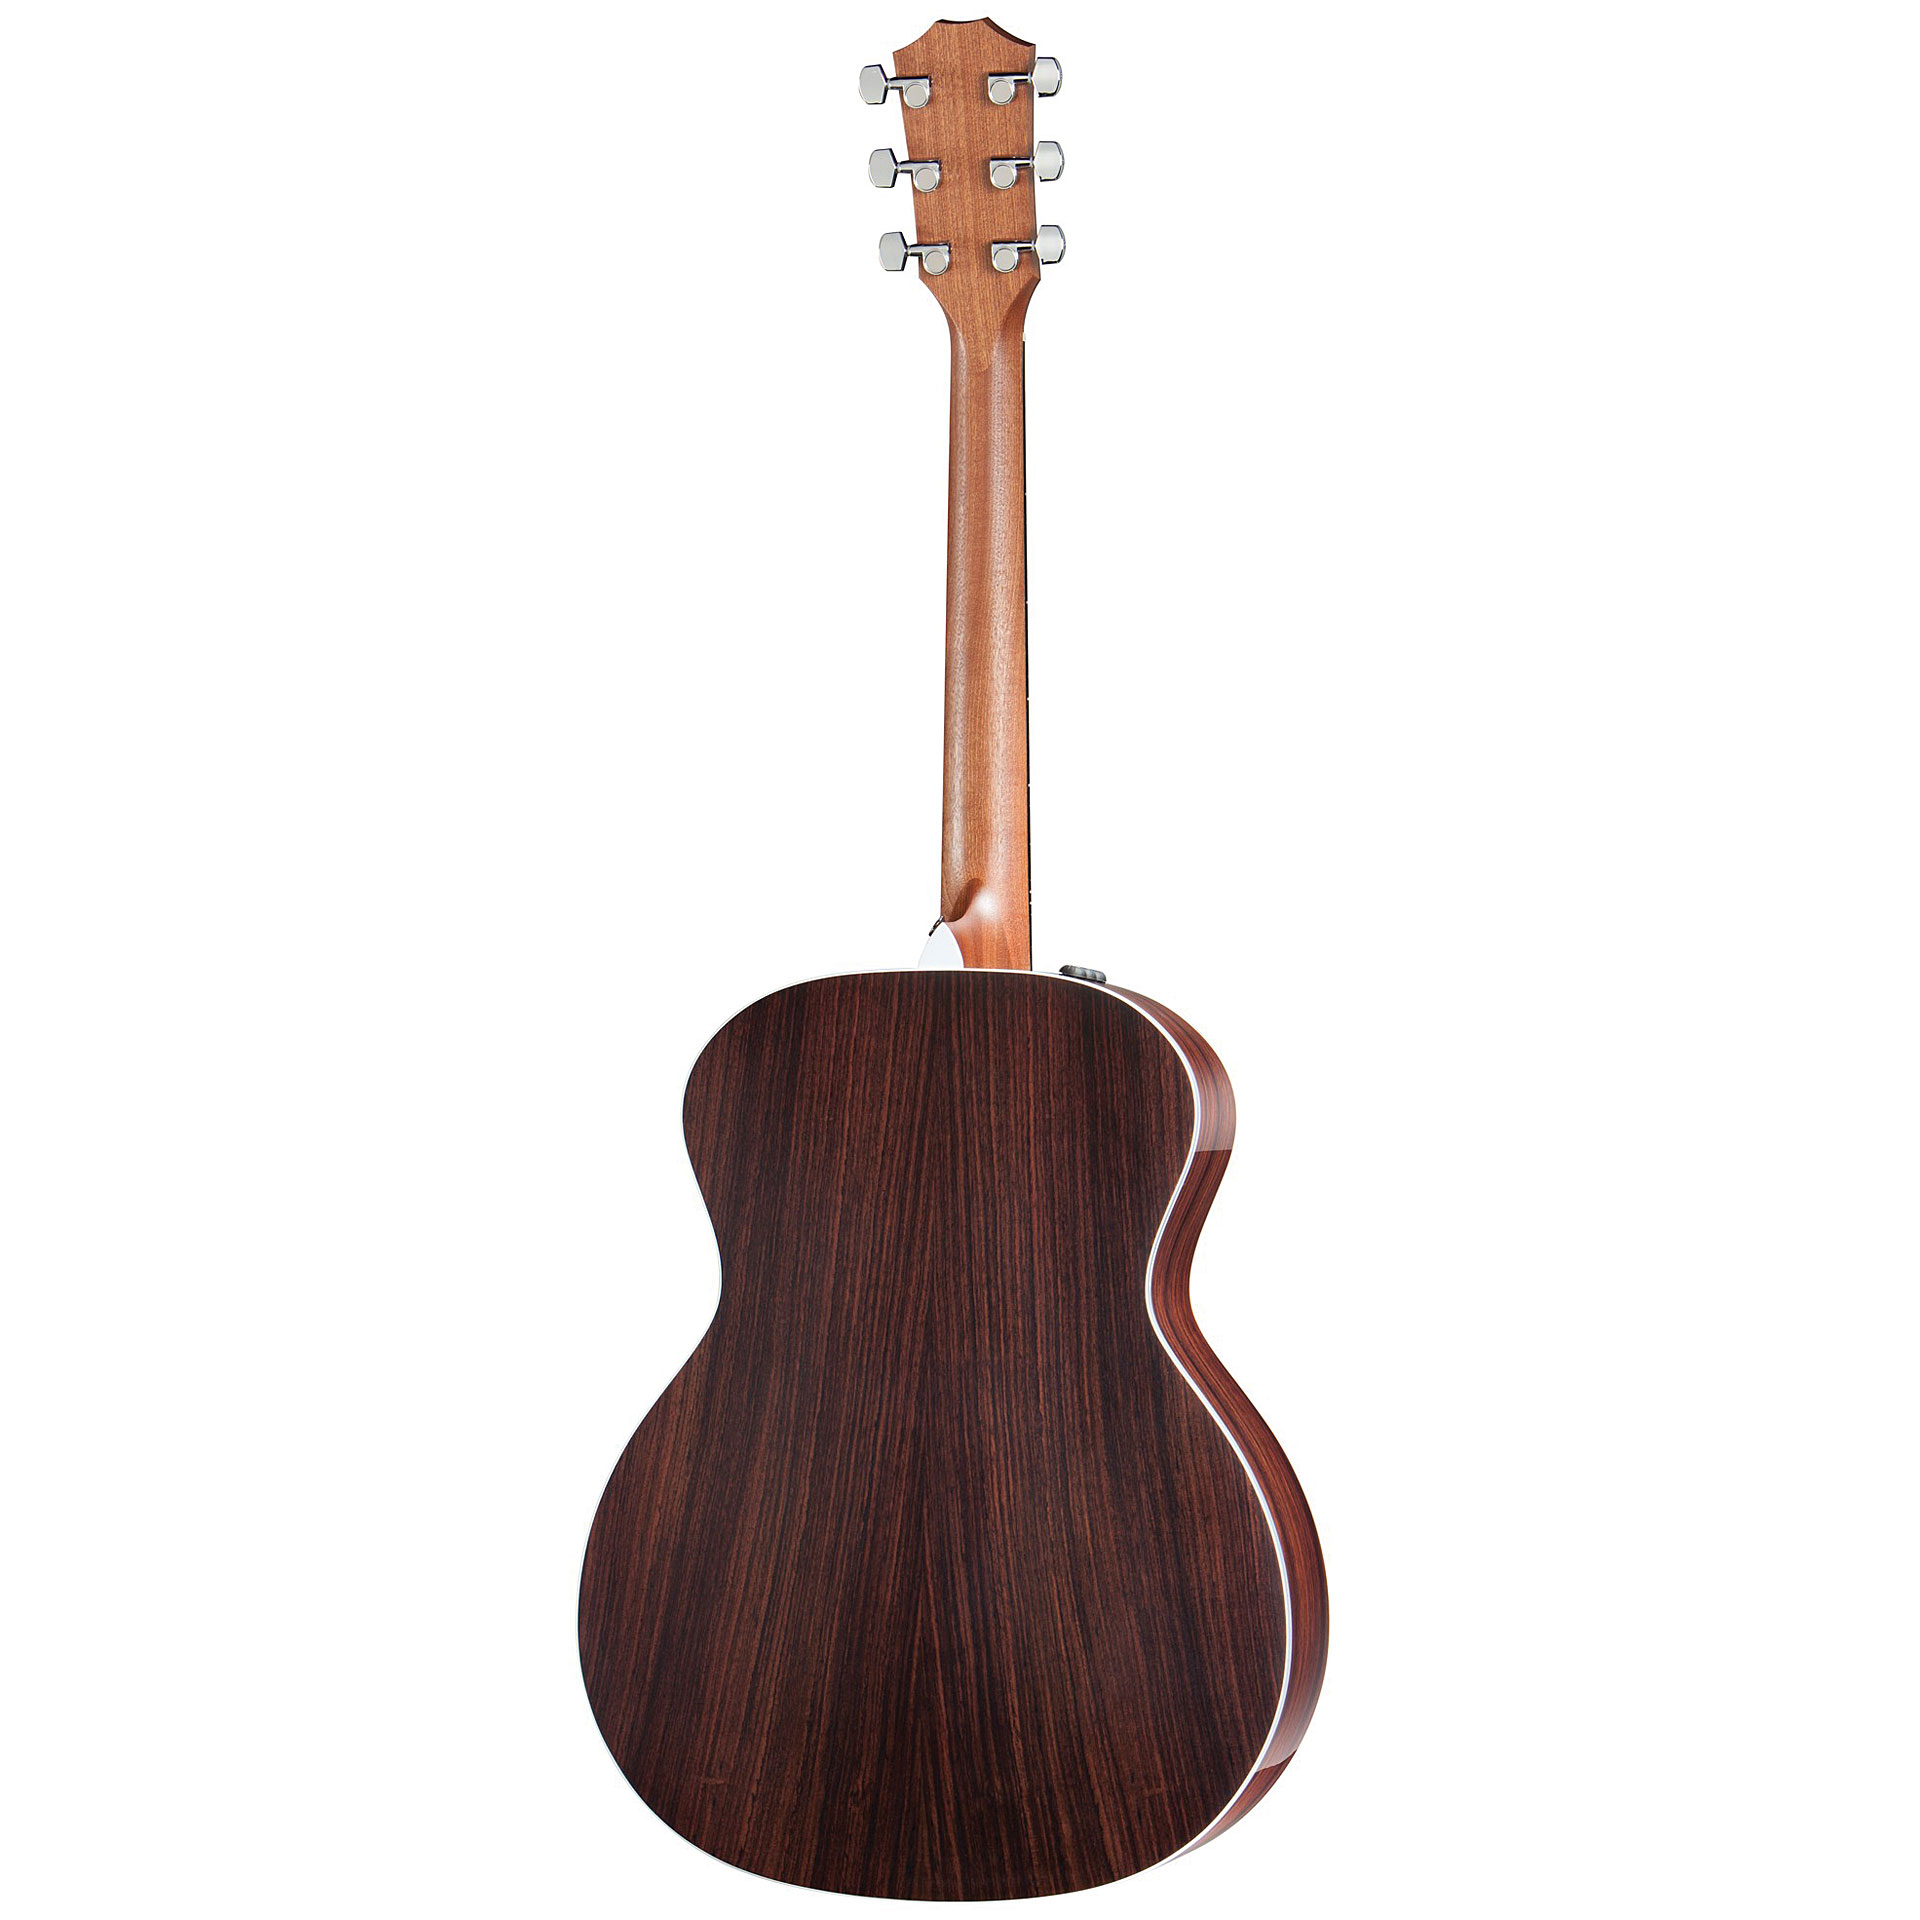 taylor 214e deluxe nat acoustic guitar. Black Bedroom Furniture Sets. Home Design Ideas